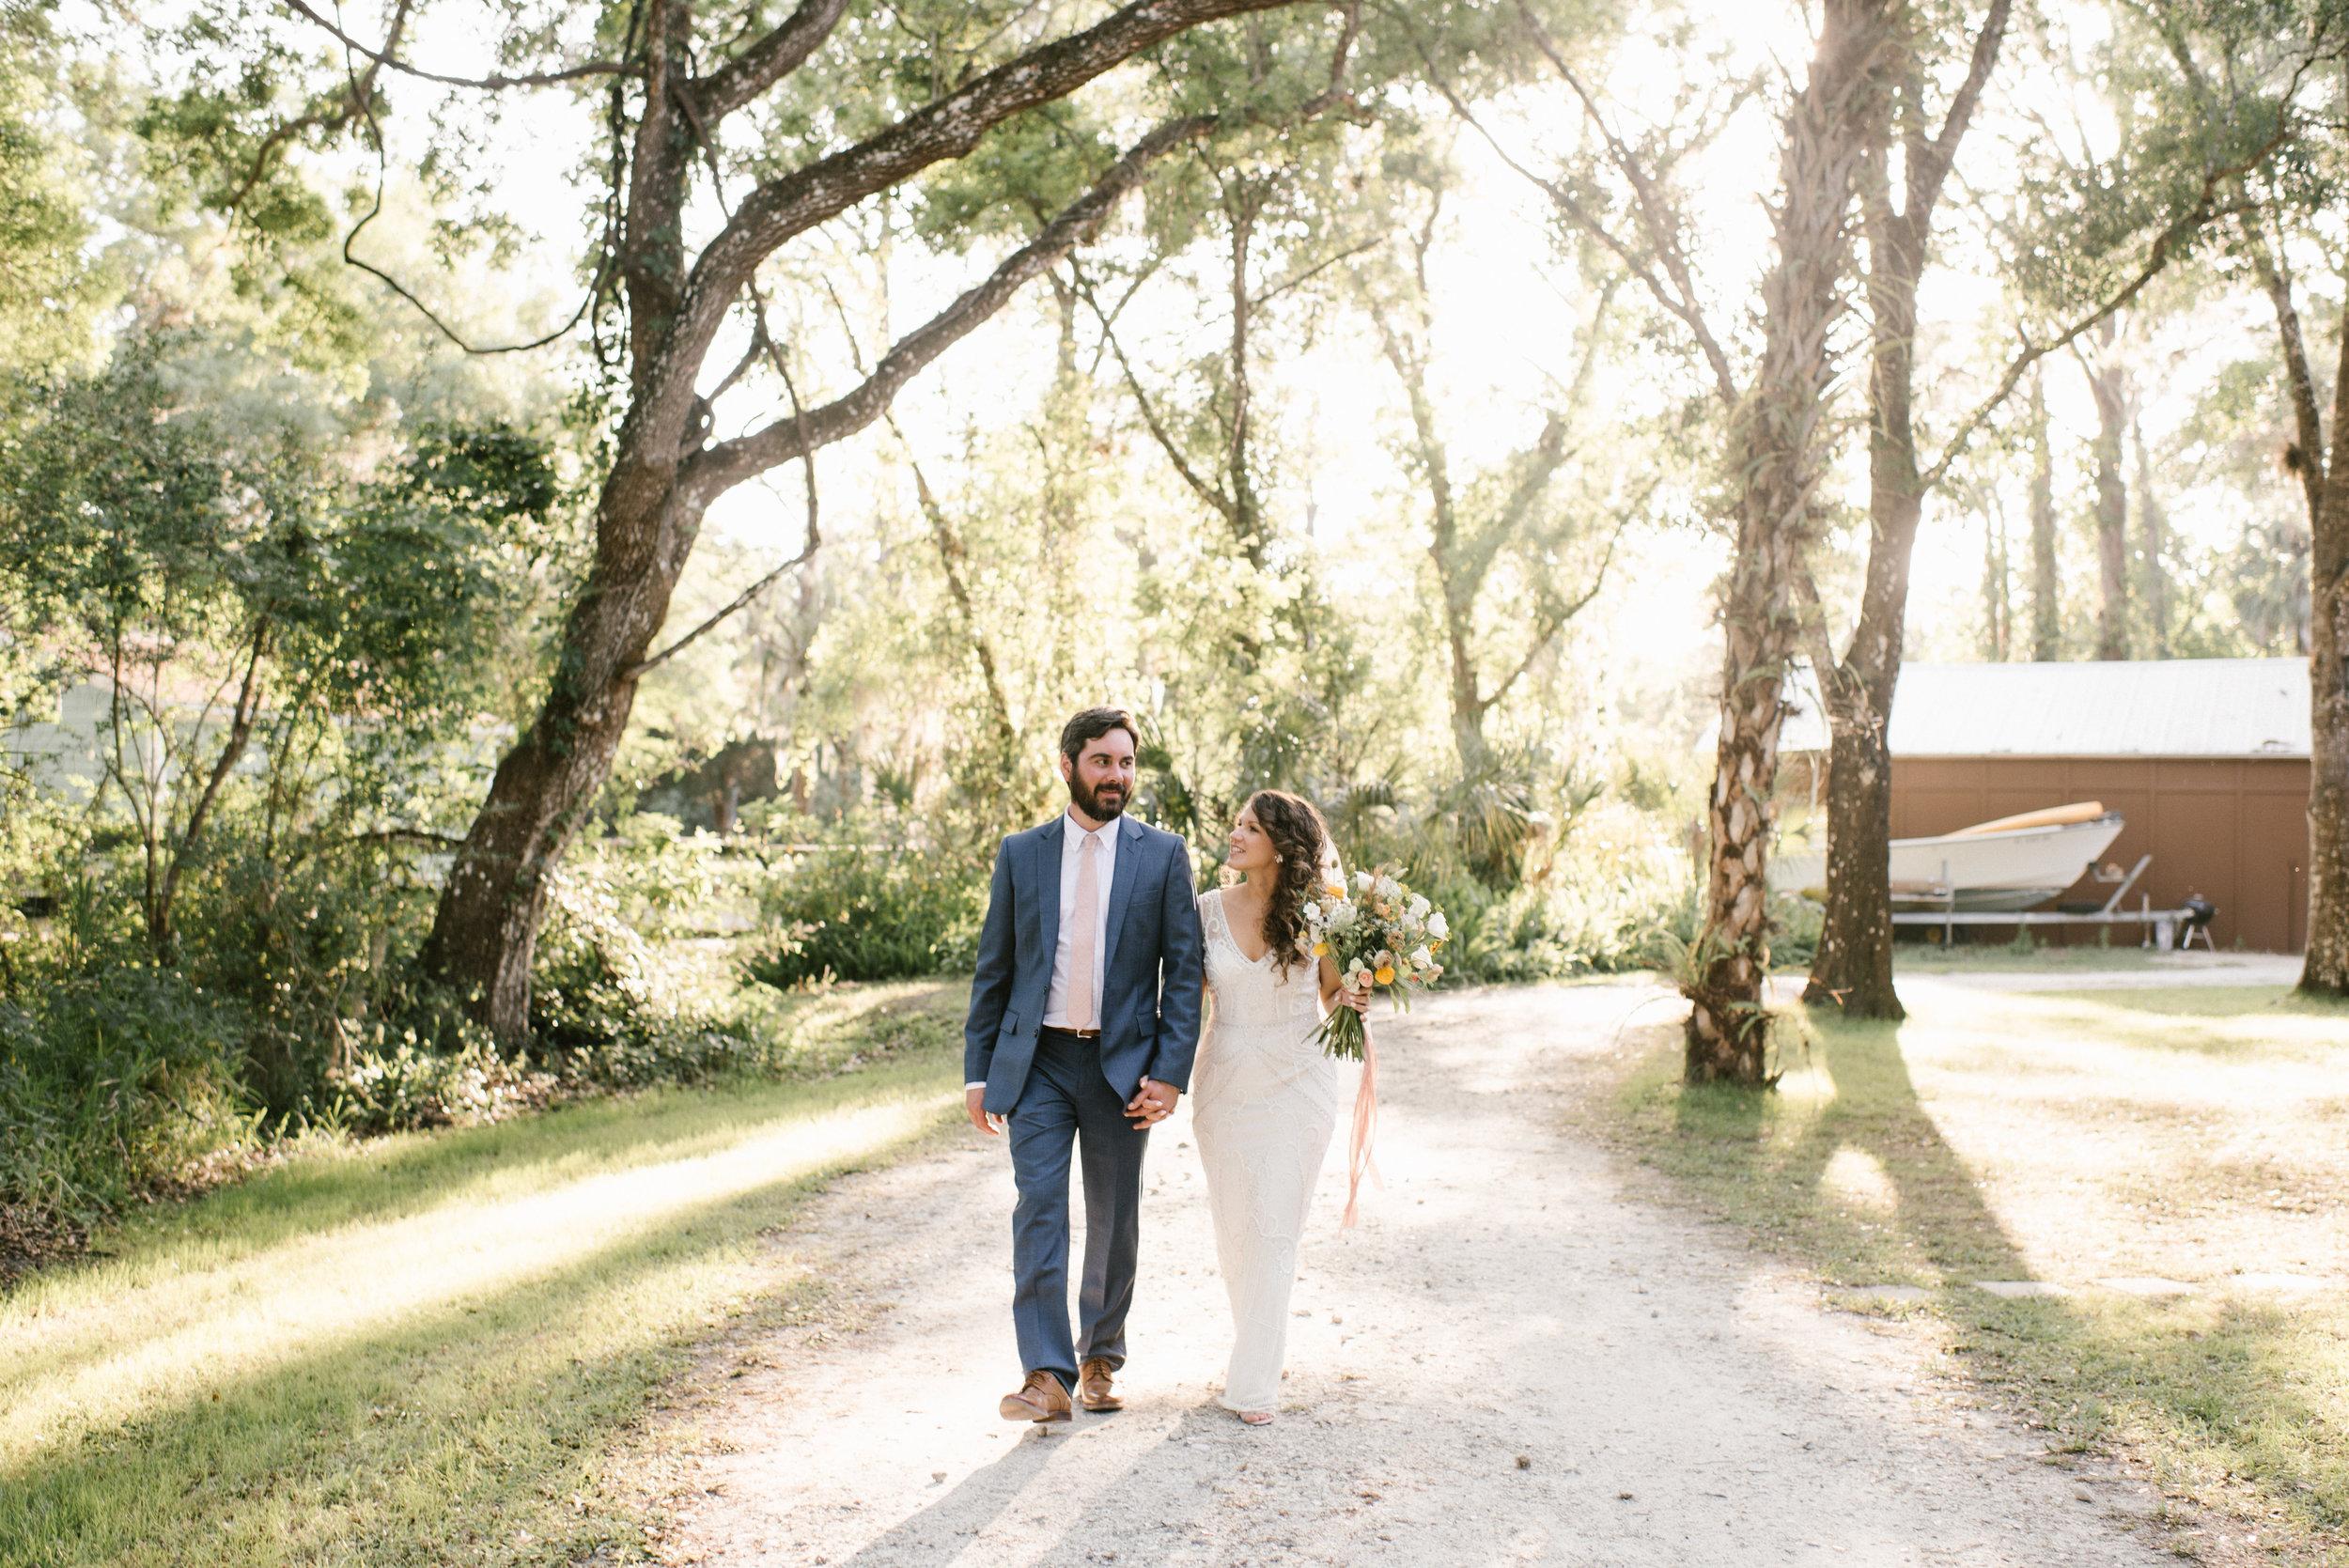 mclaughlin-wedding-739.jpg